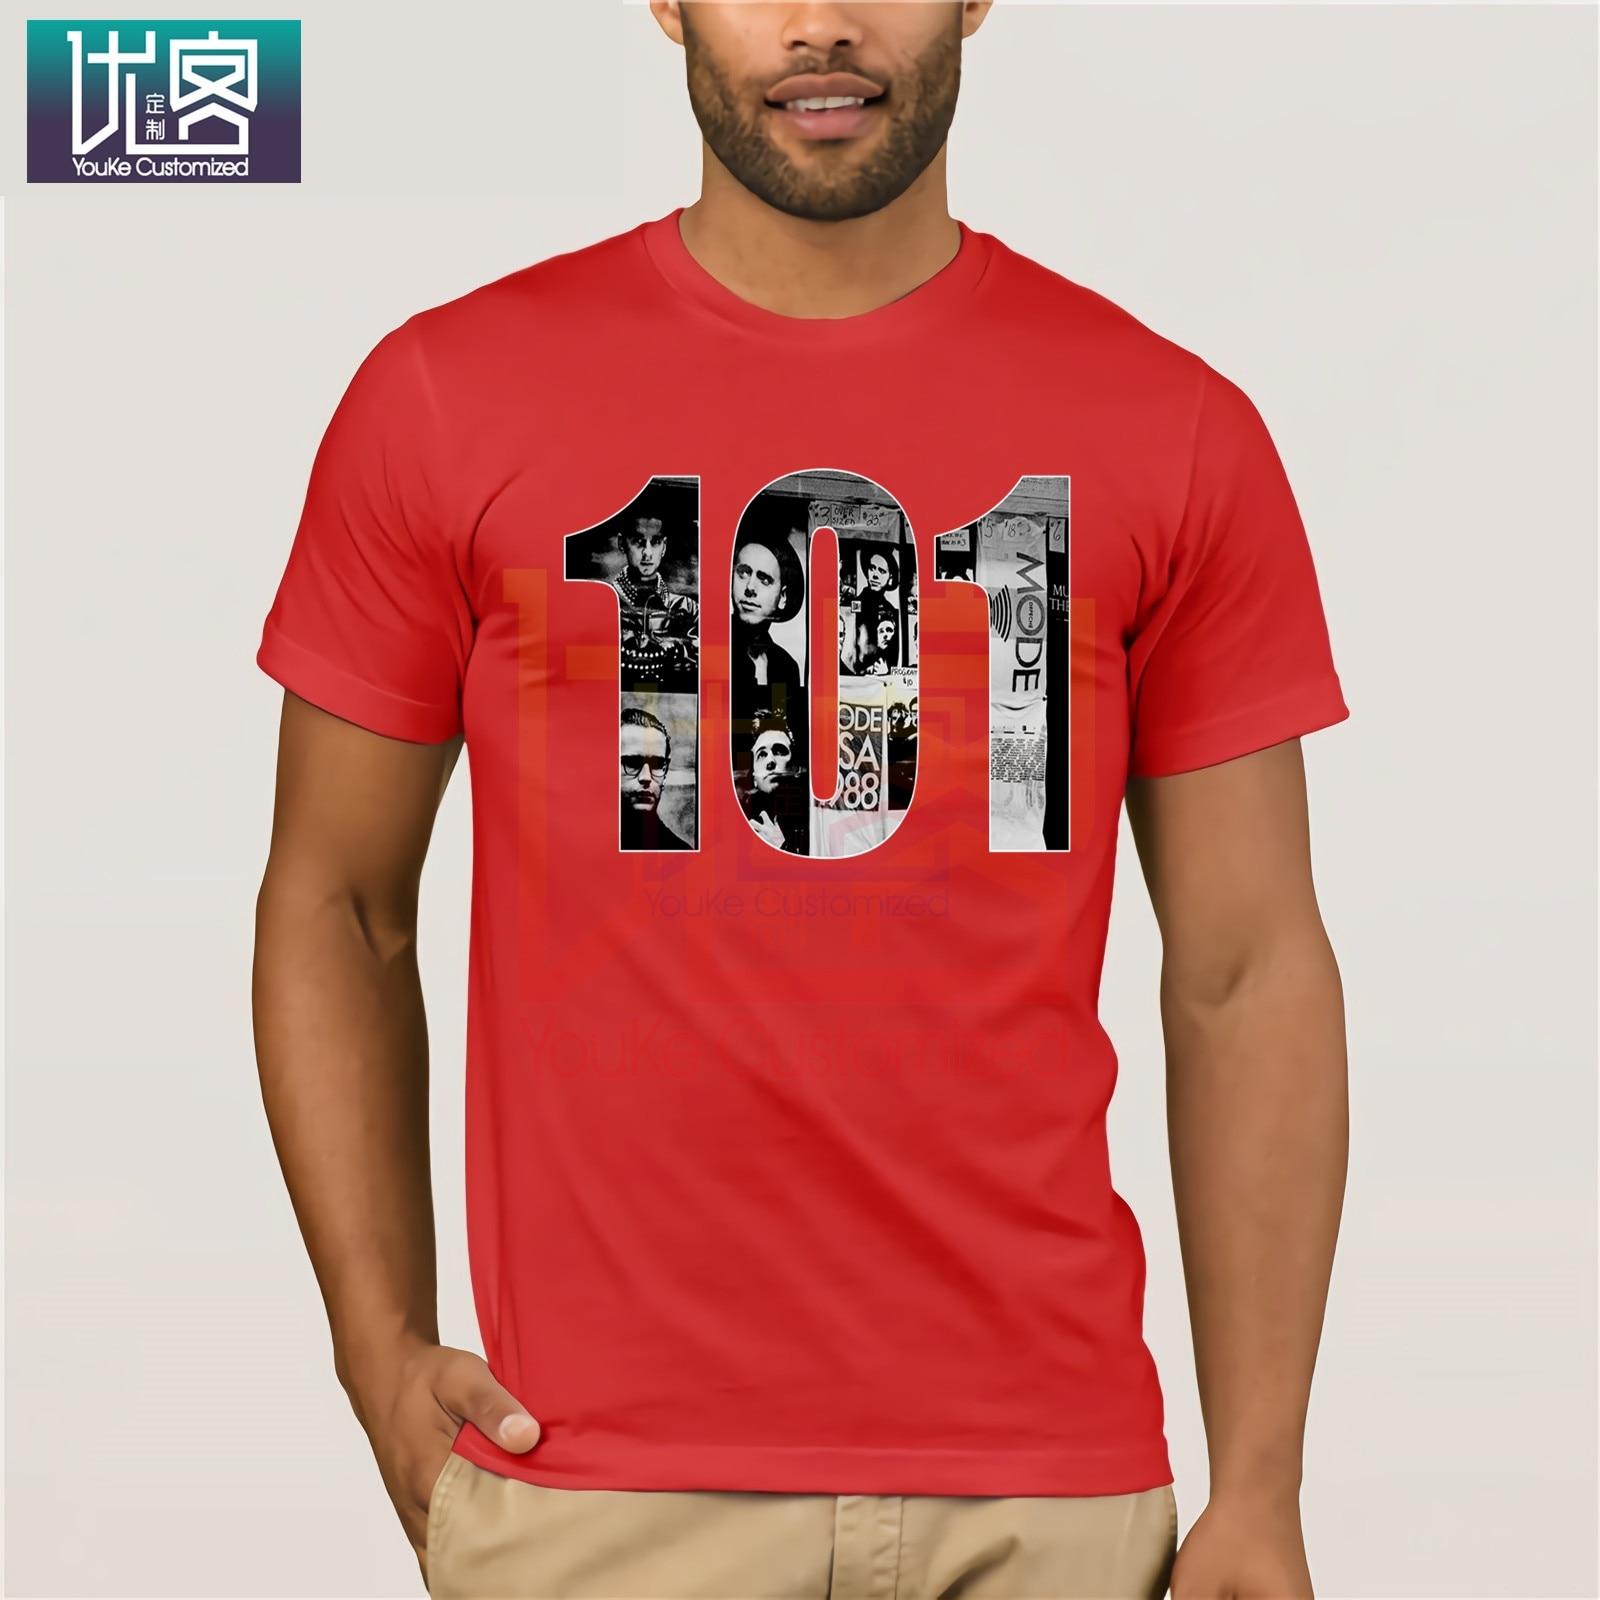 Depeche 101  Mode Music In 2020 T-Shirt Clothes Popular T-Shirt Crewneck 100% Cotton Tees Tops Summer Tees Cotton O Neck T-Shirt